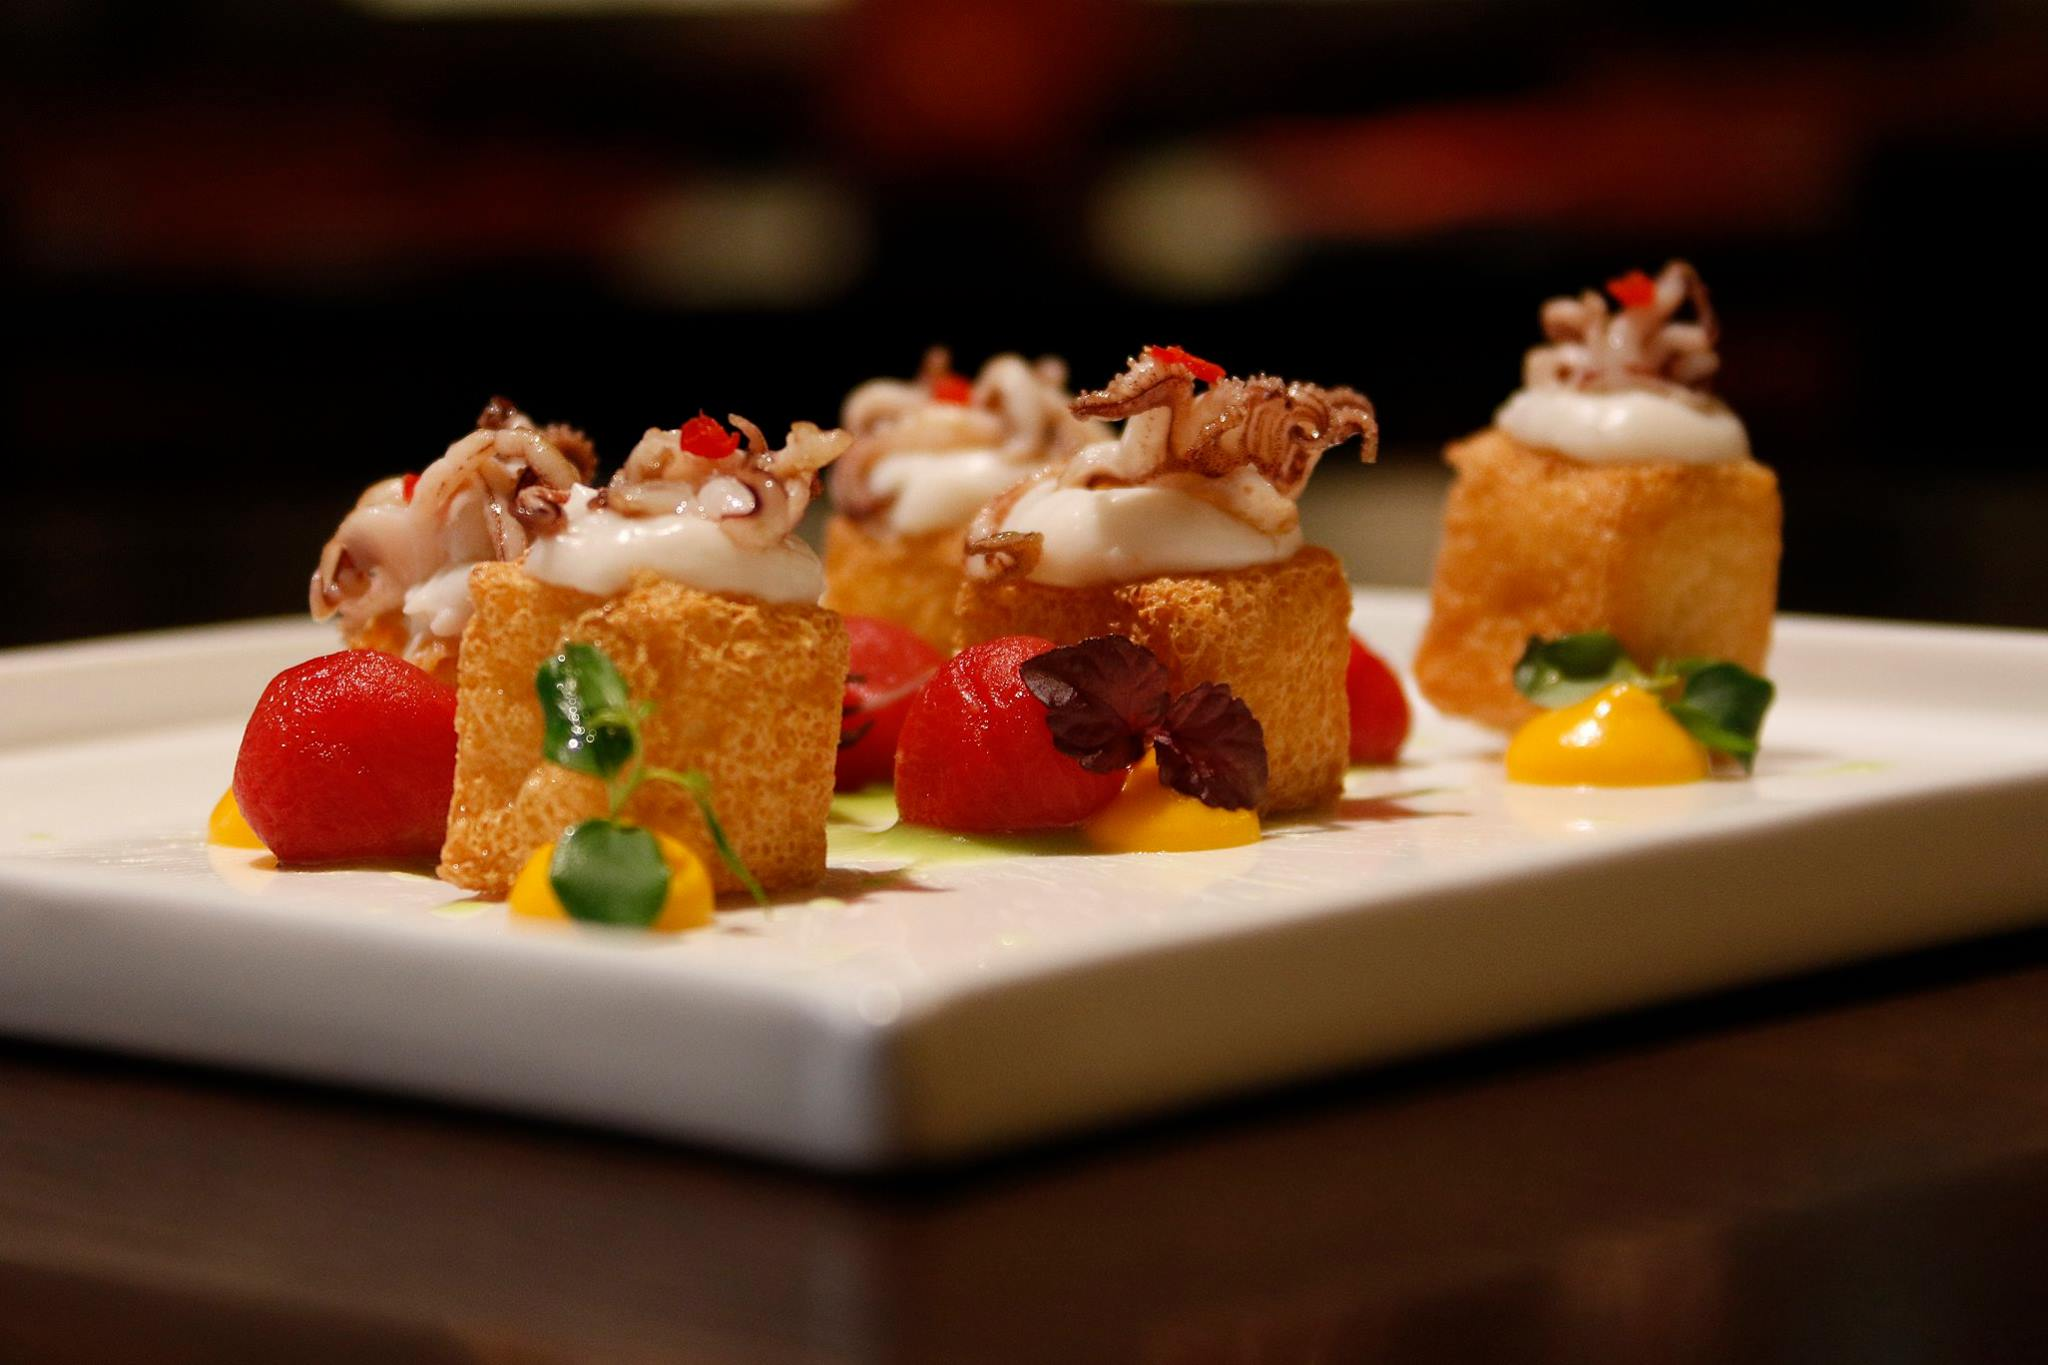 Nobu Milano Restaurant - Book restaurants online with ResDiary